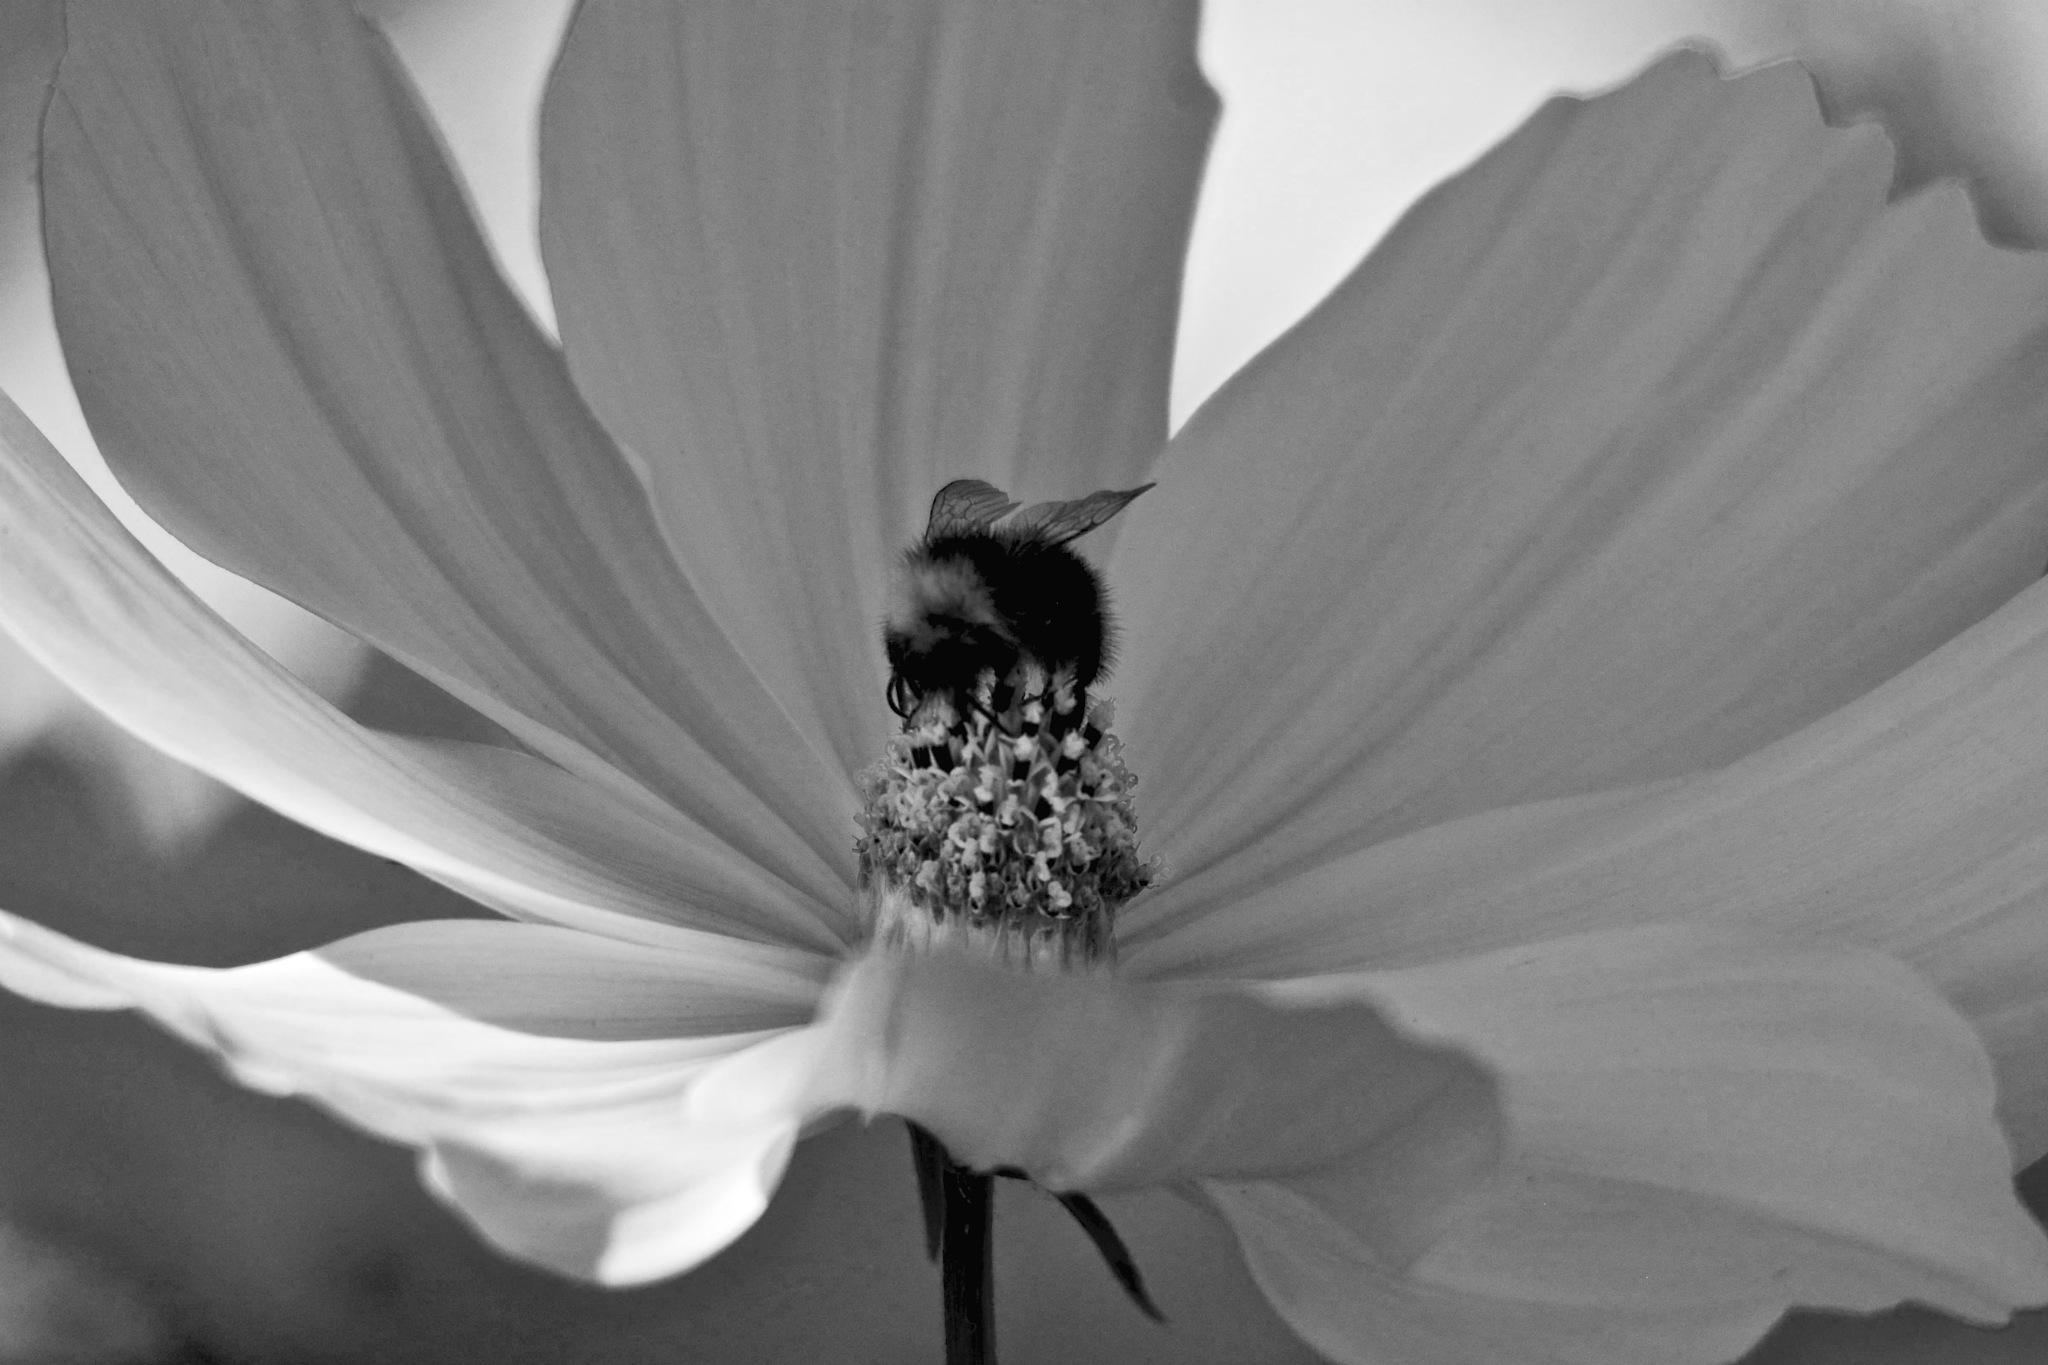 BW Flowers 1.003 by Lars-Toralf Utnes Storstrand